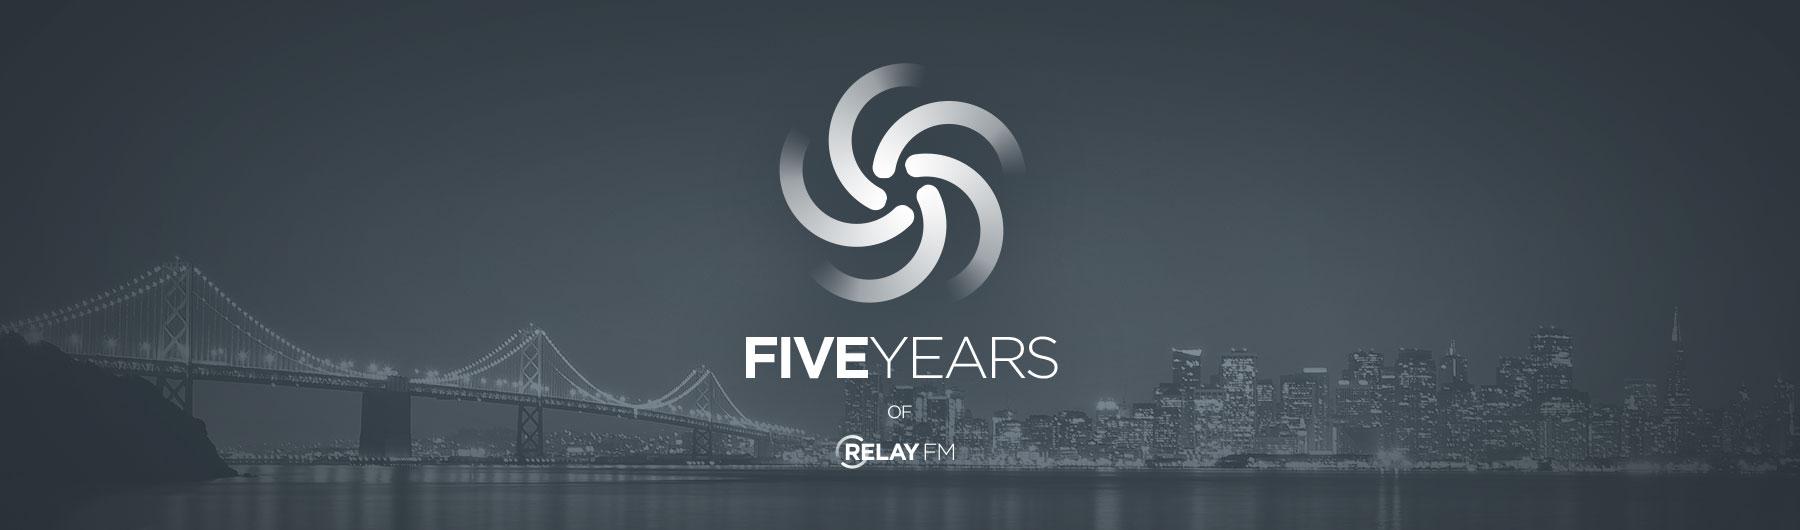 Relay FM 5th Anniversary Live Show